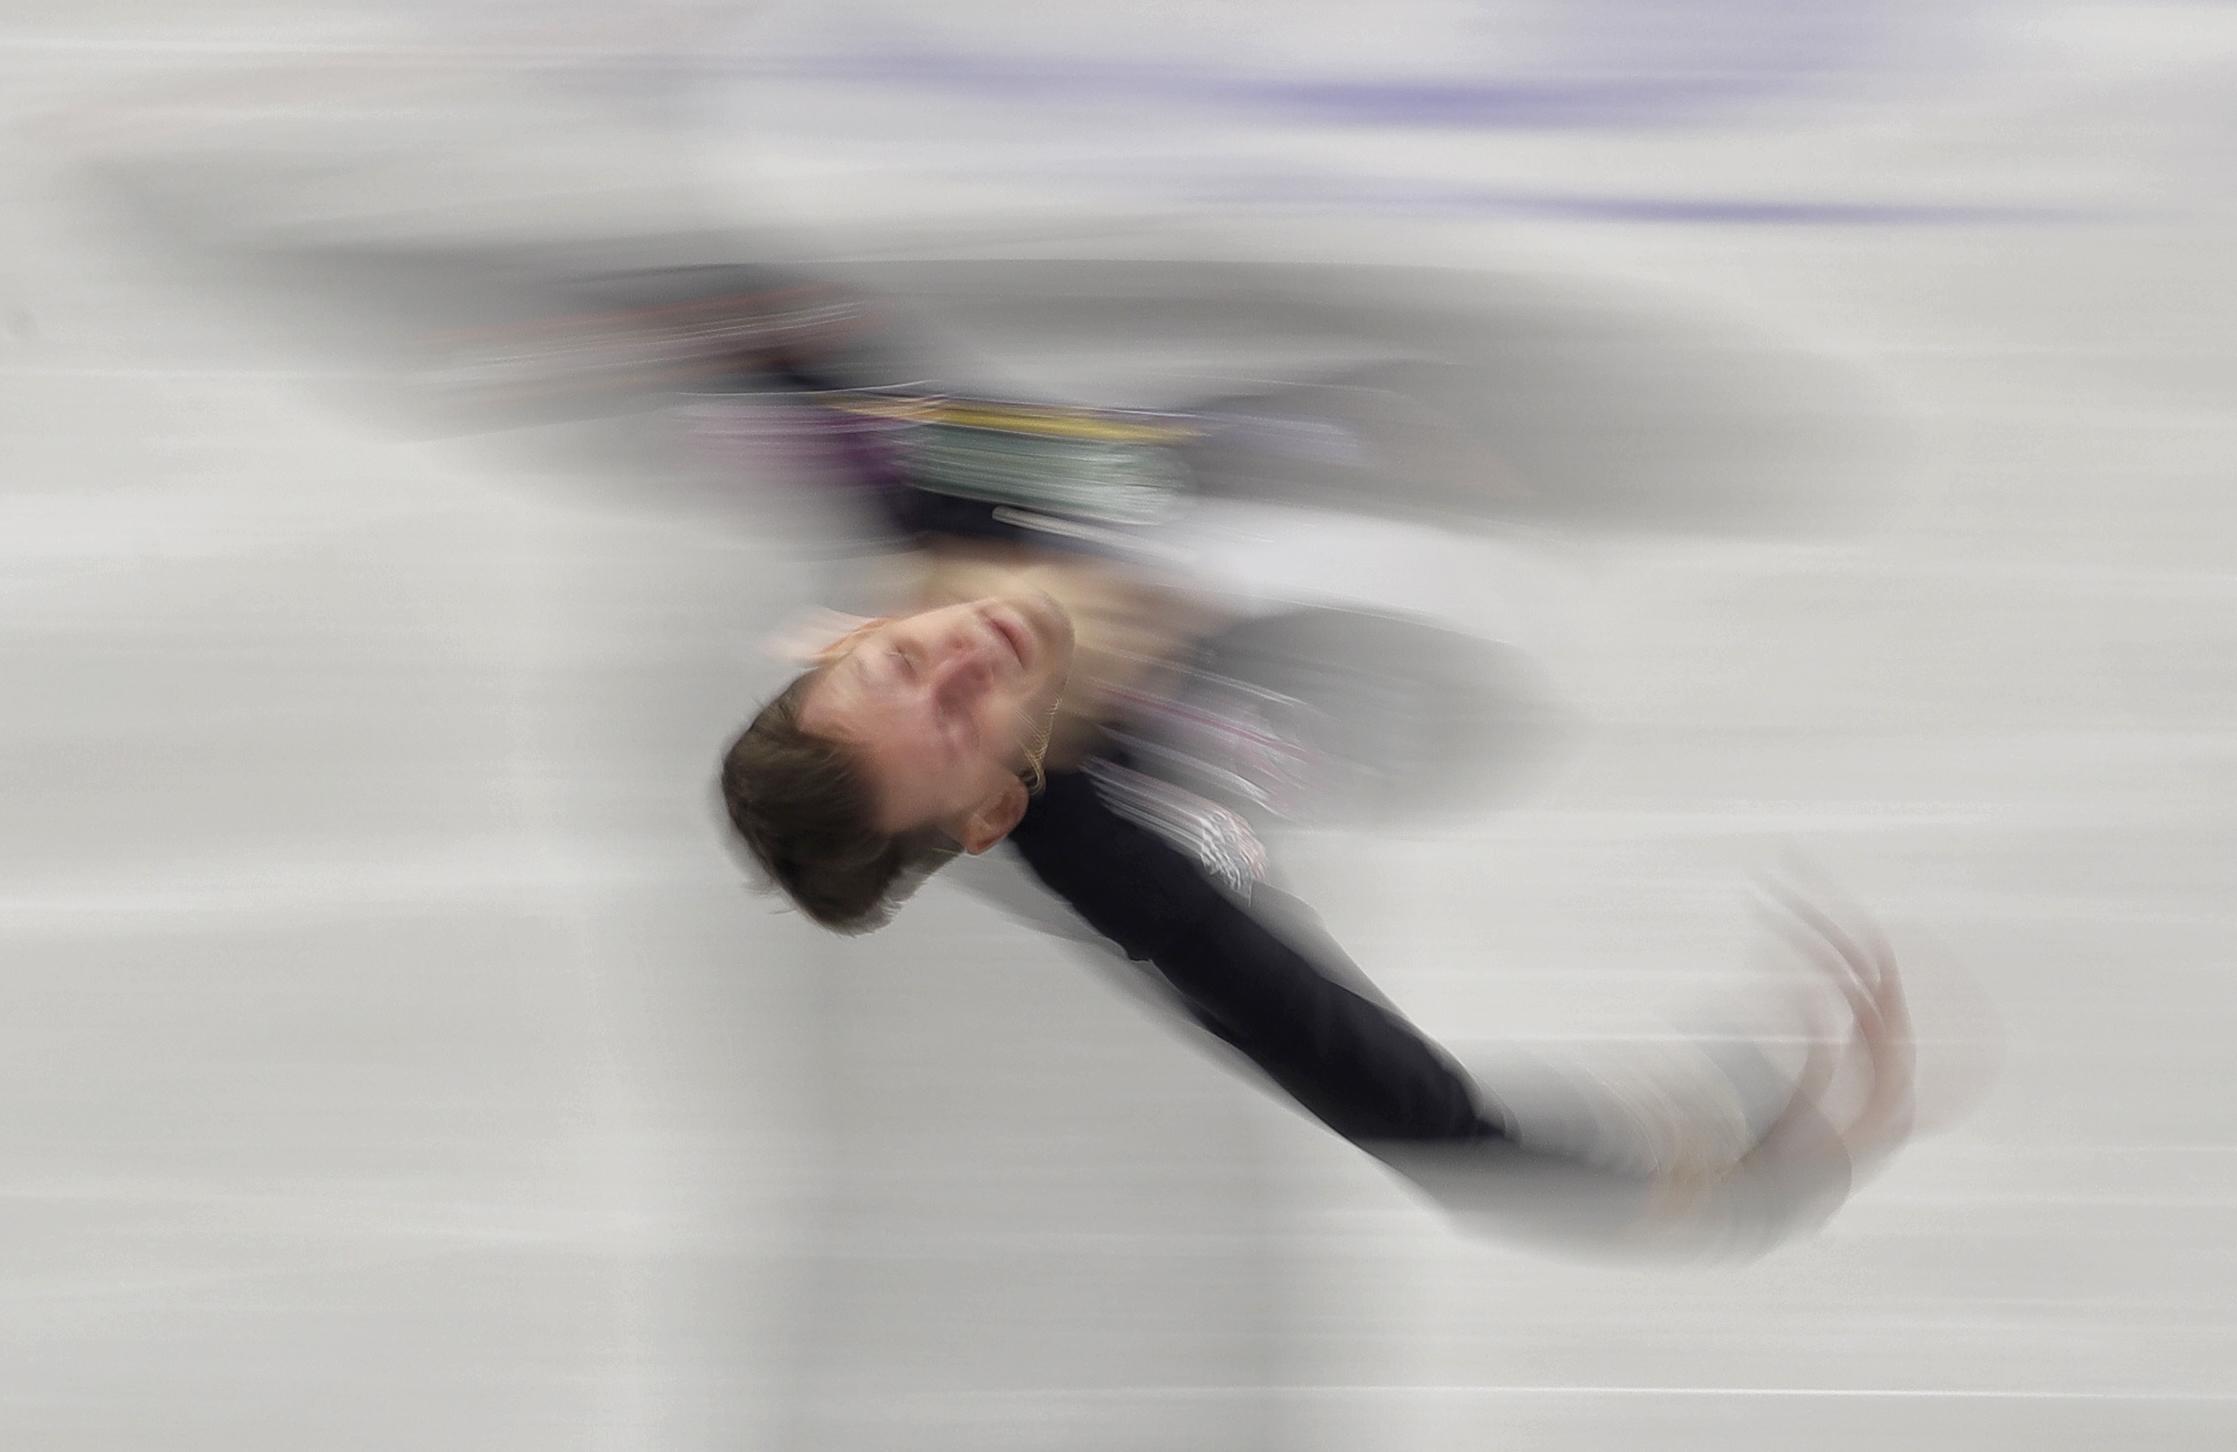 Russia's Maxim Kovtun skates his short program at the European Figure Skating Championships in Ostrava, Czech Republic, Friday, Jan. 27, 2017. (AP Photo/Petr David Josek)